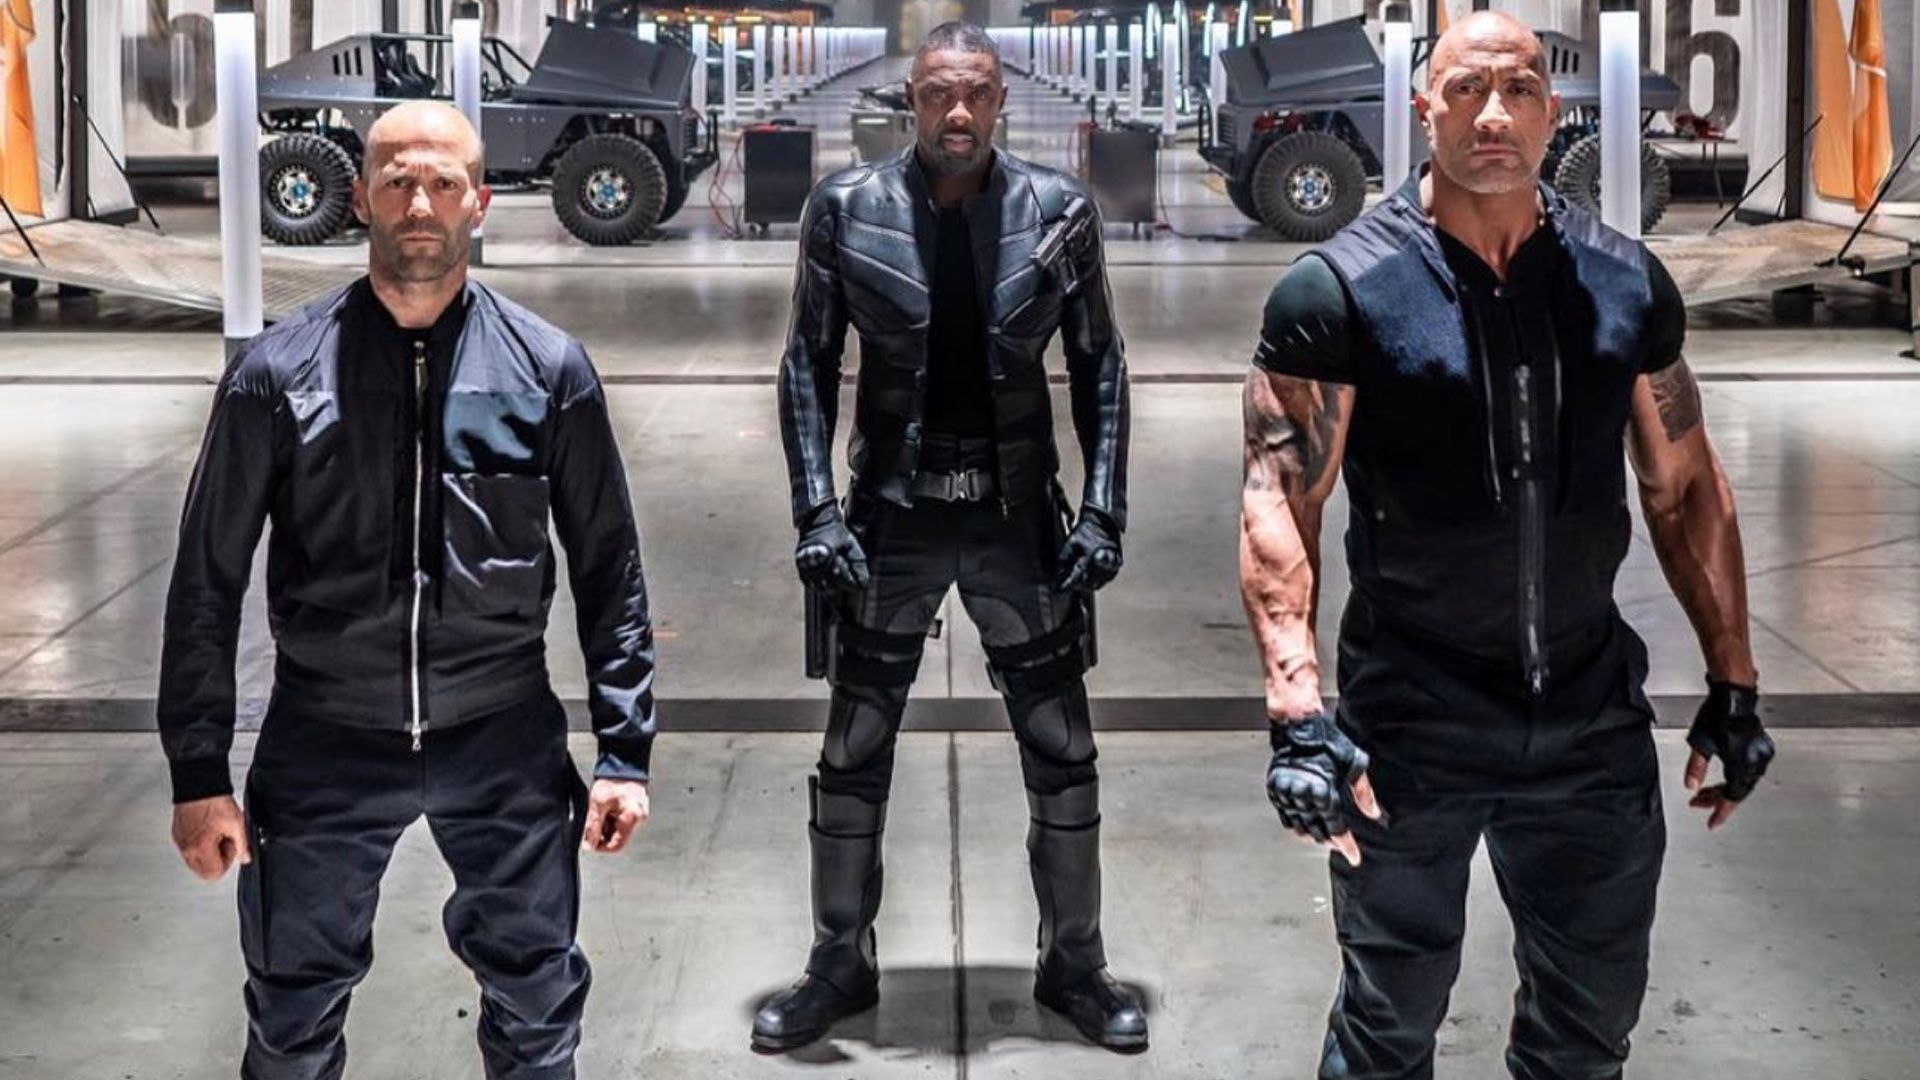 New Hobbs And Shaw Photo Features Dwayne Johnson Jason Statham And Idris Elba Looking Like Badasses Geektyrant Dwayne Johnson Fast And Furious Hobbs